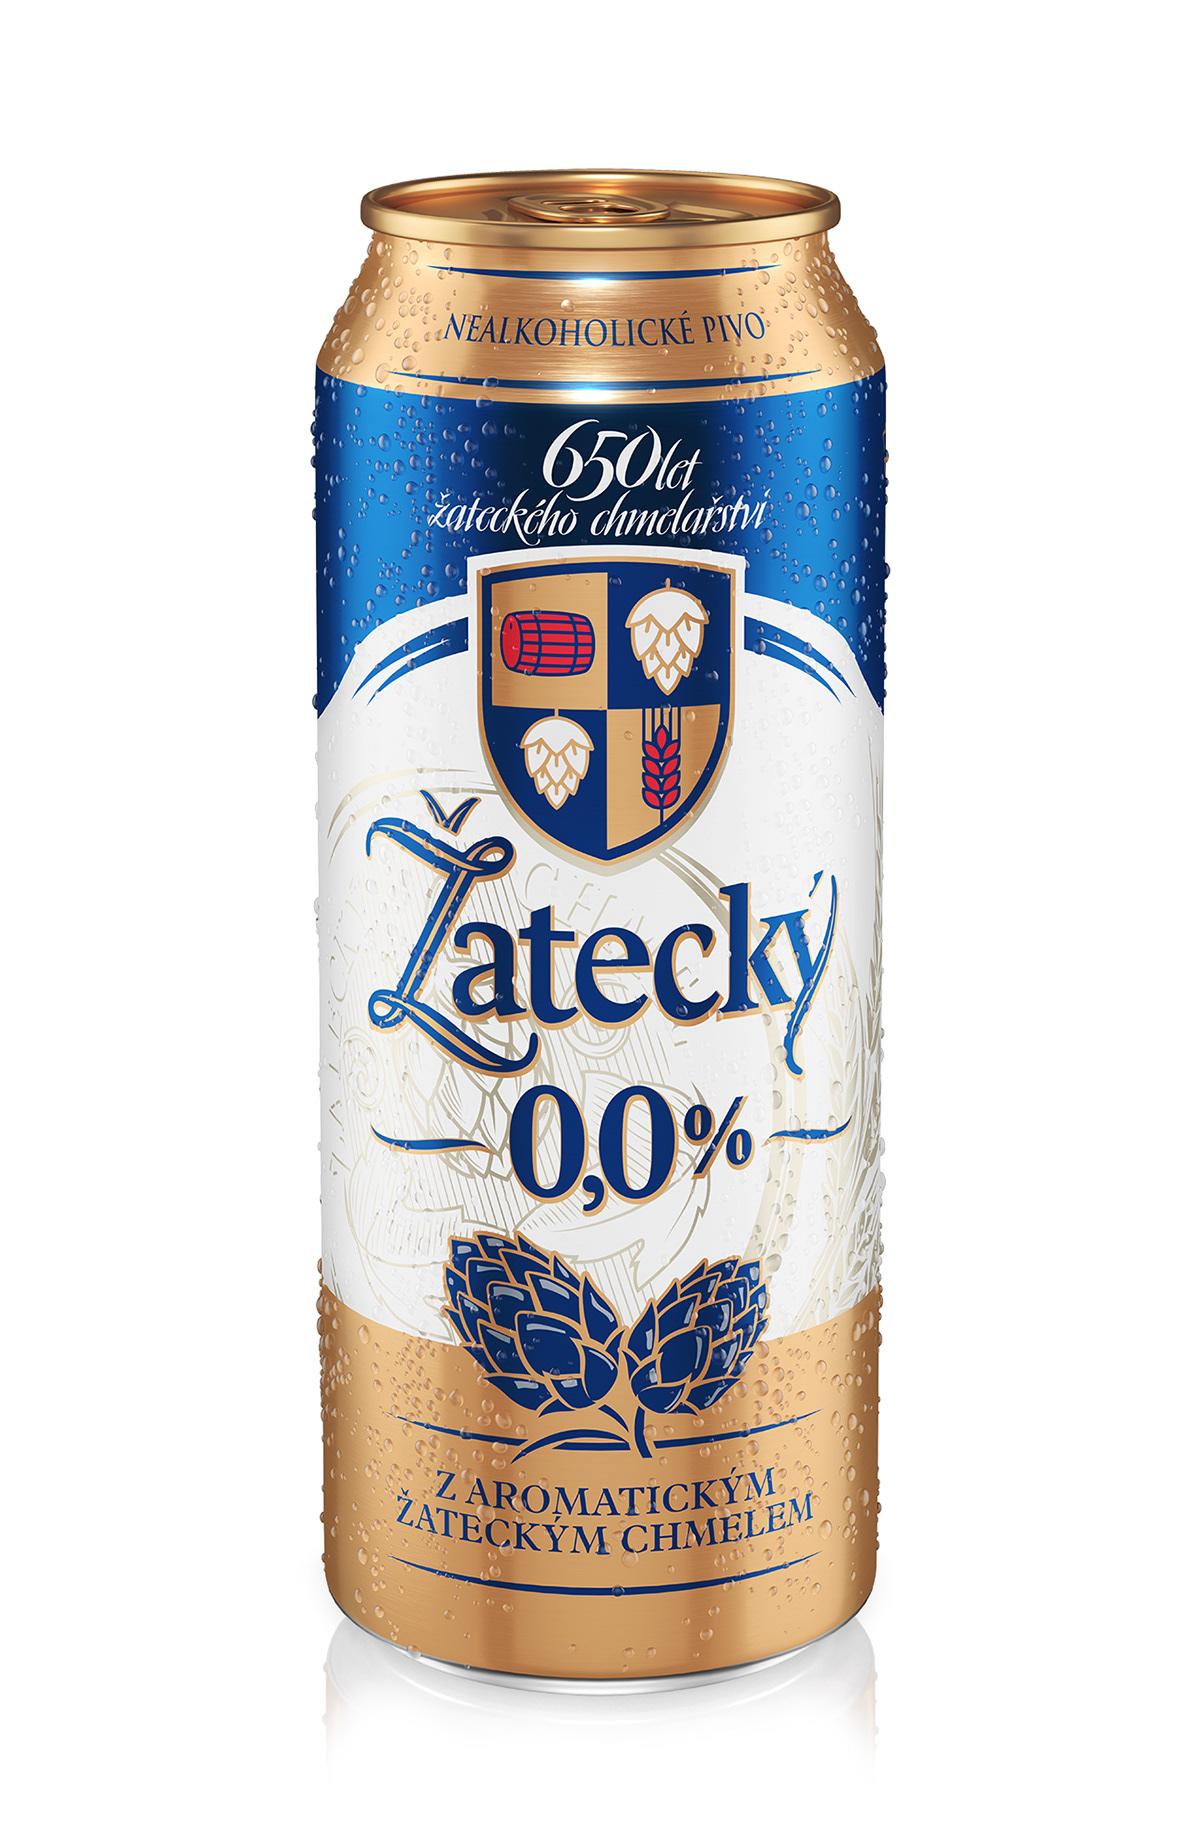 beer Packshot piwo Render Zatecky